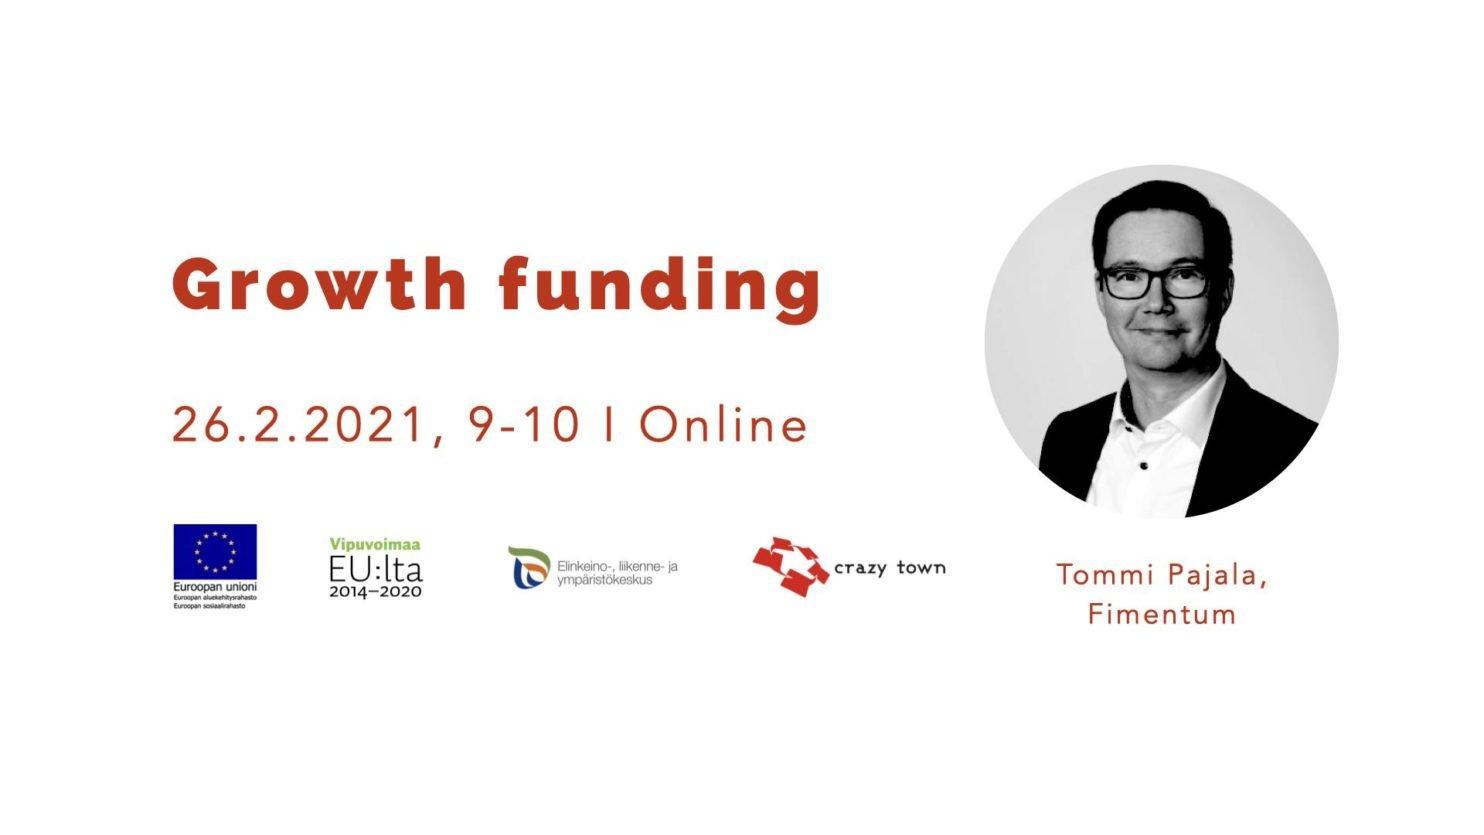 Growthfunding